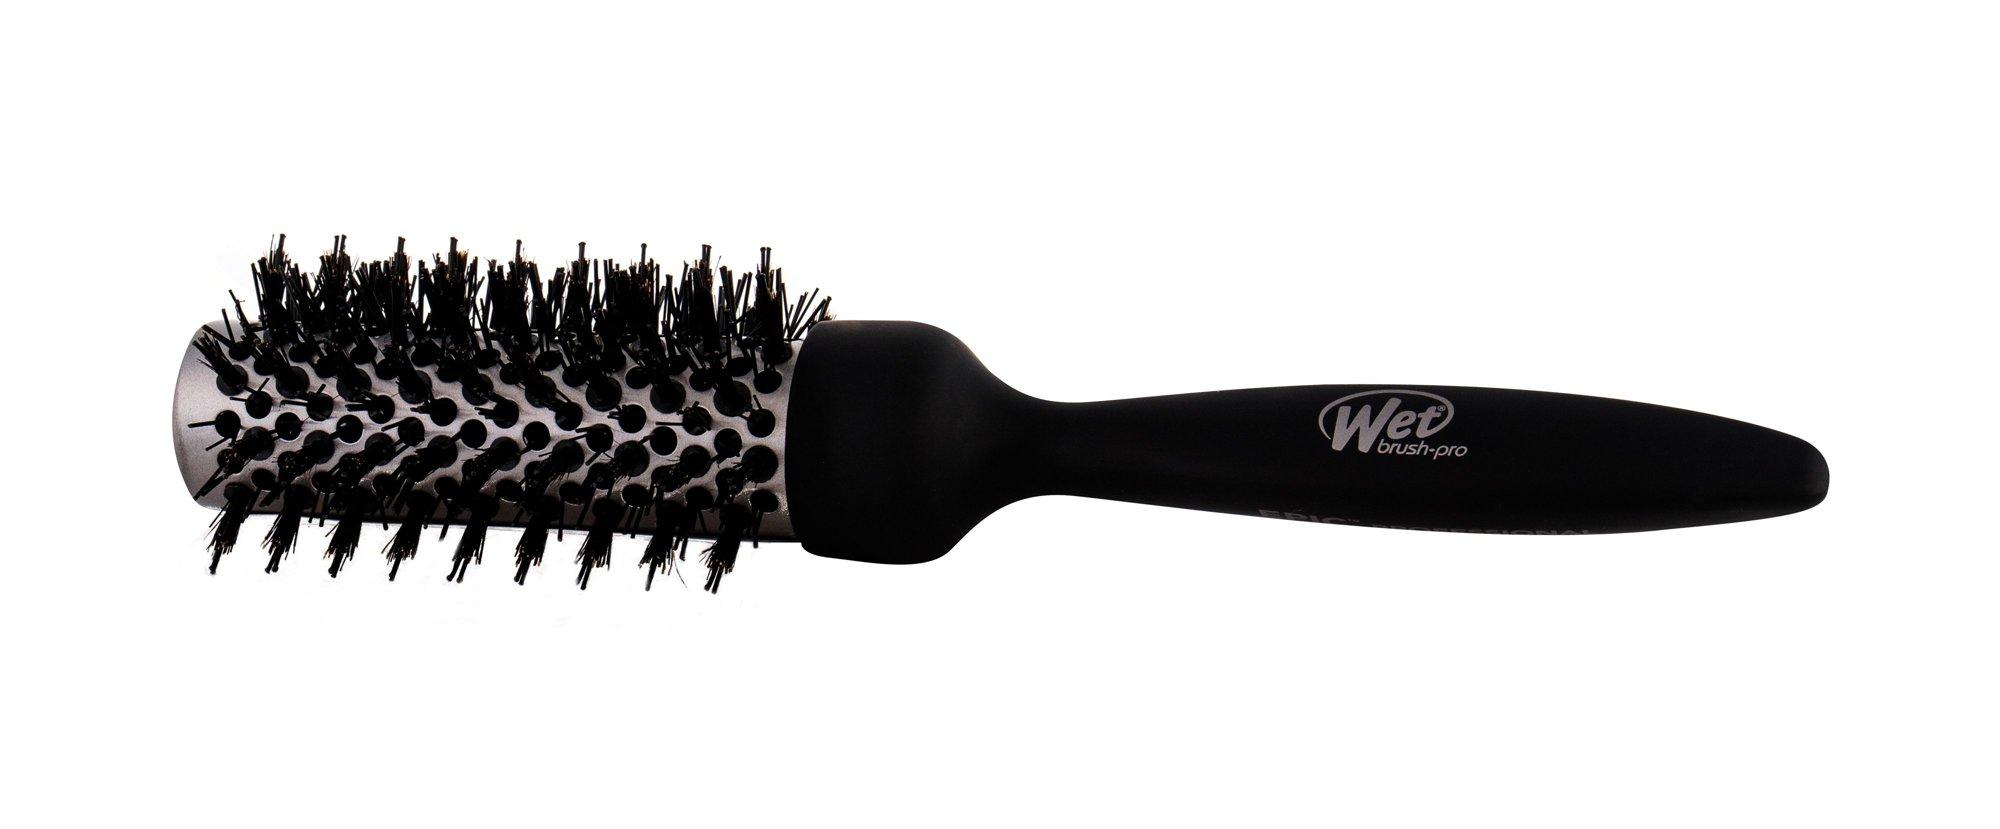 Wet Brush Epic Professional Hairbrush 1ml  Super Smooth